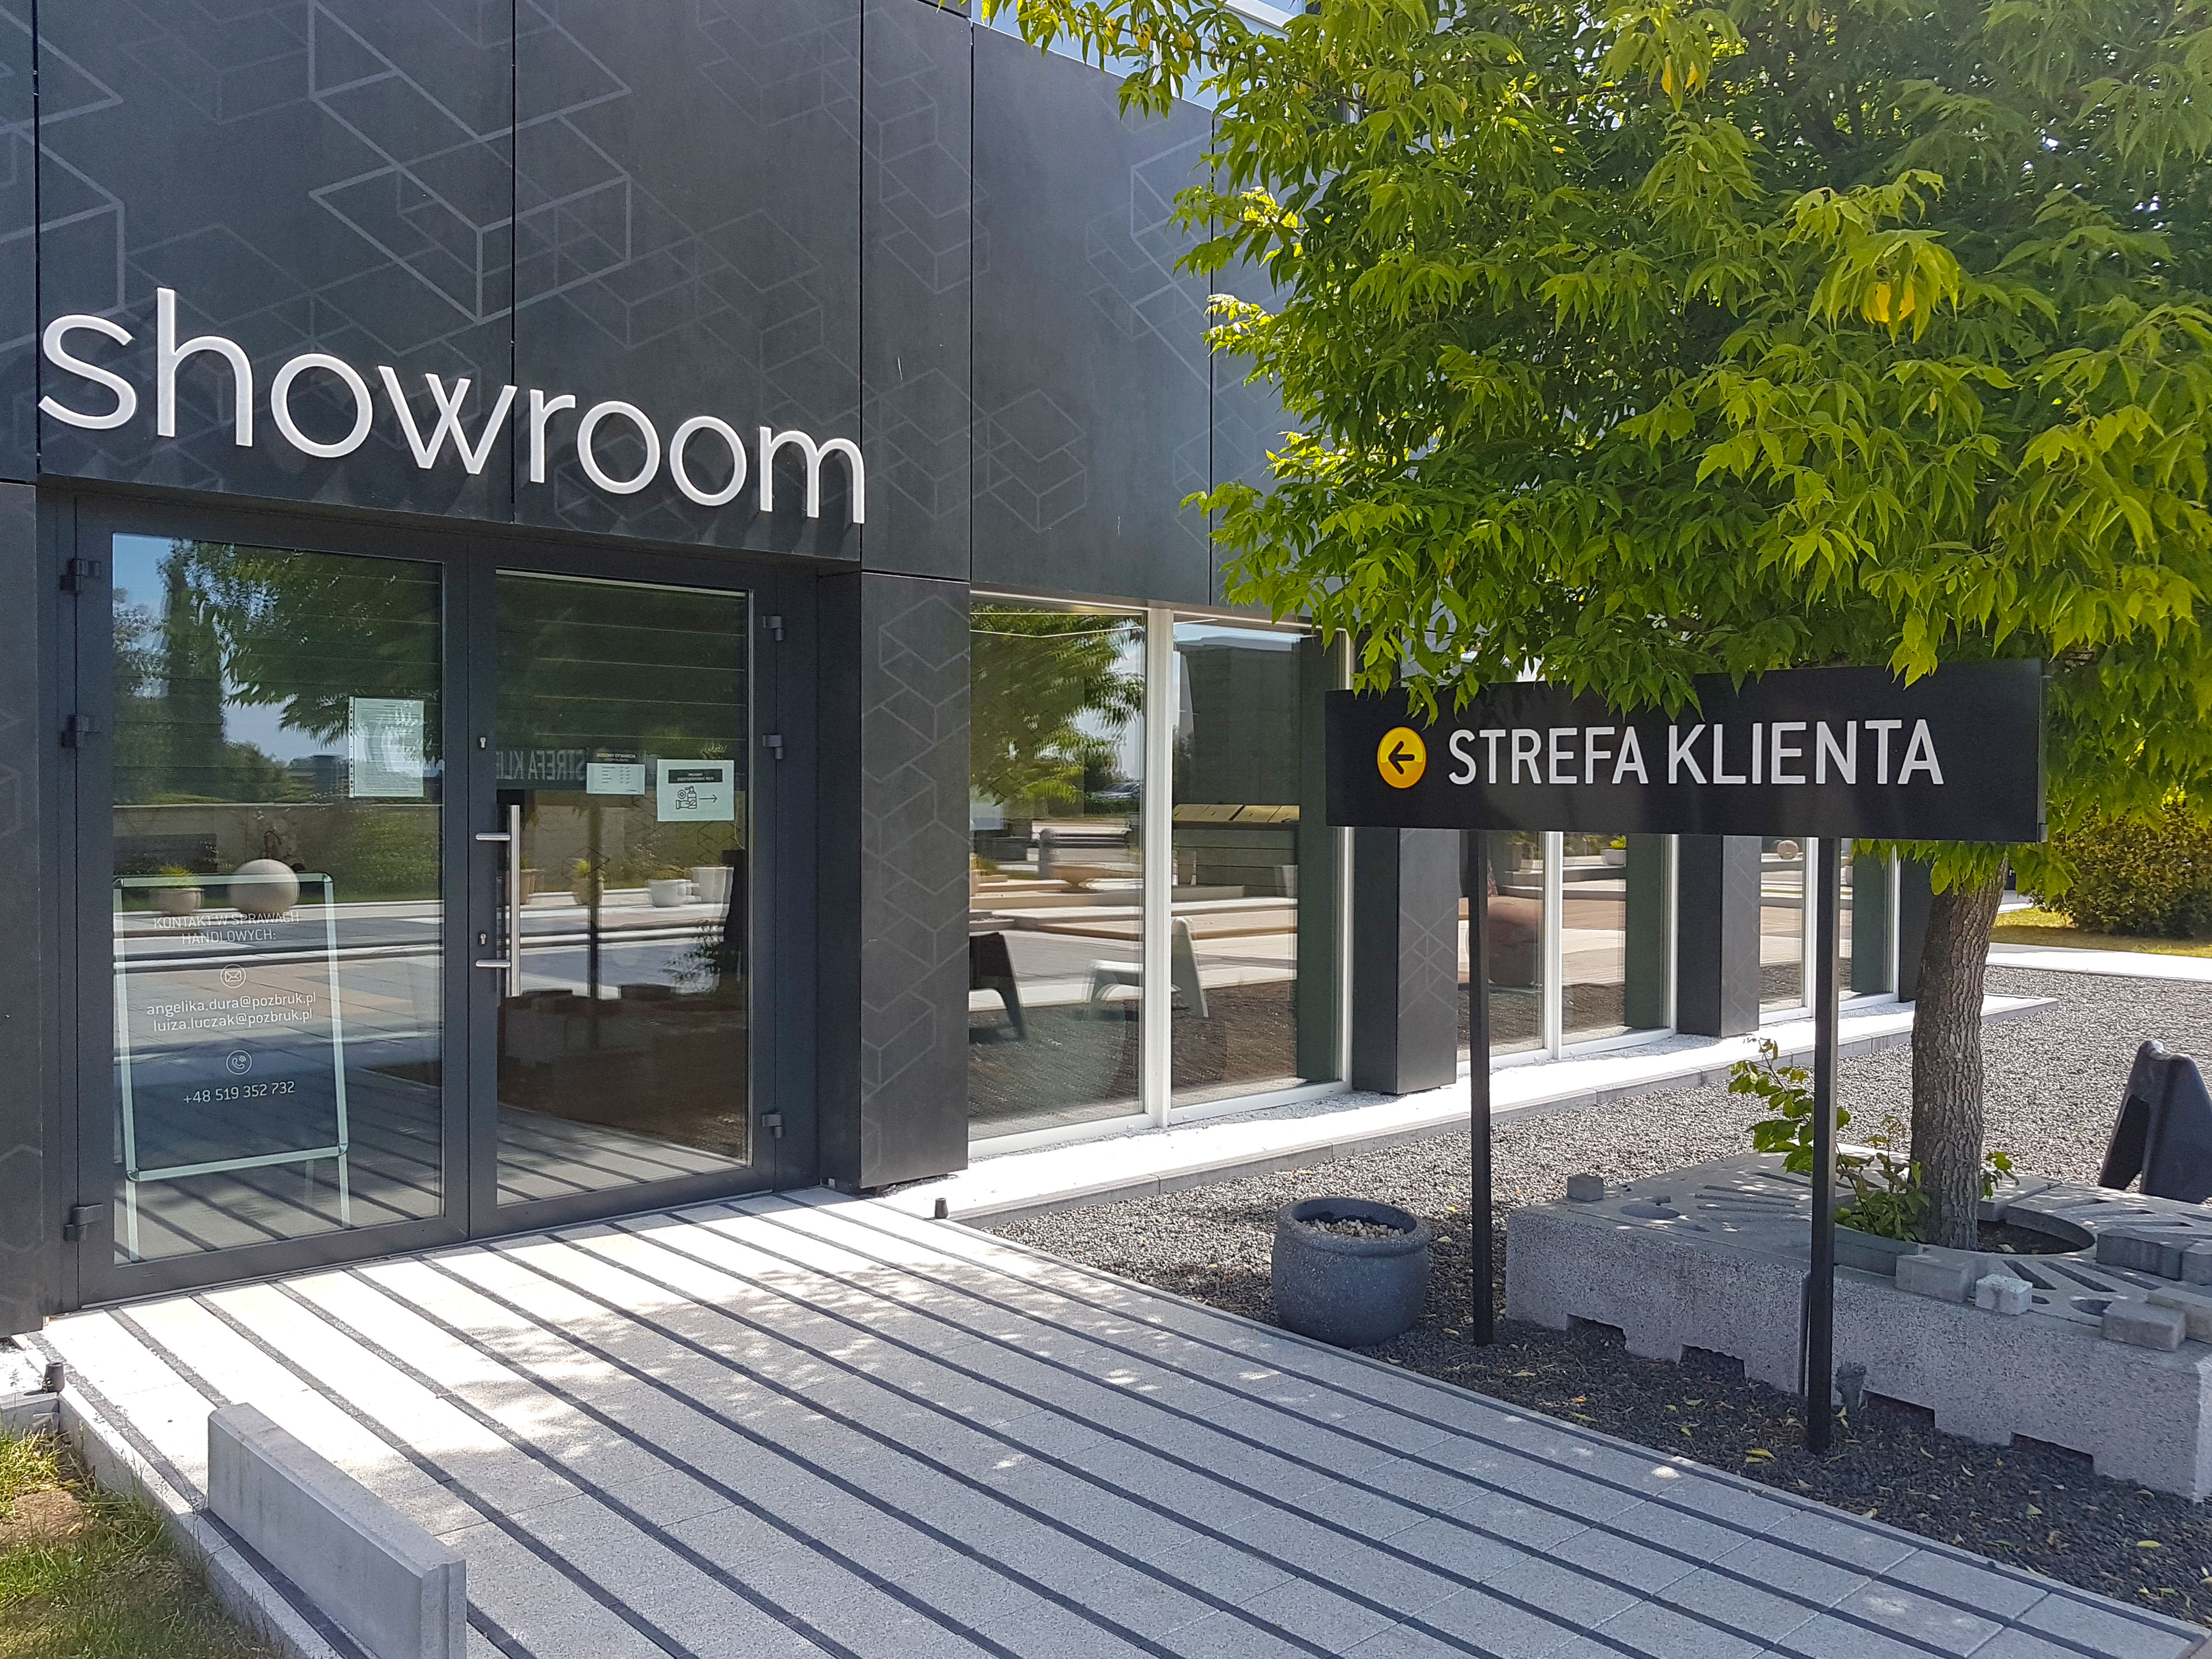 Shwroom Scalamid Biuro obsługi klienta